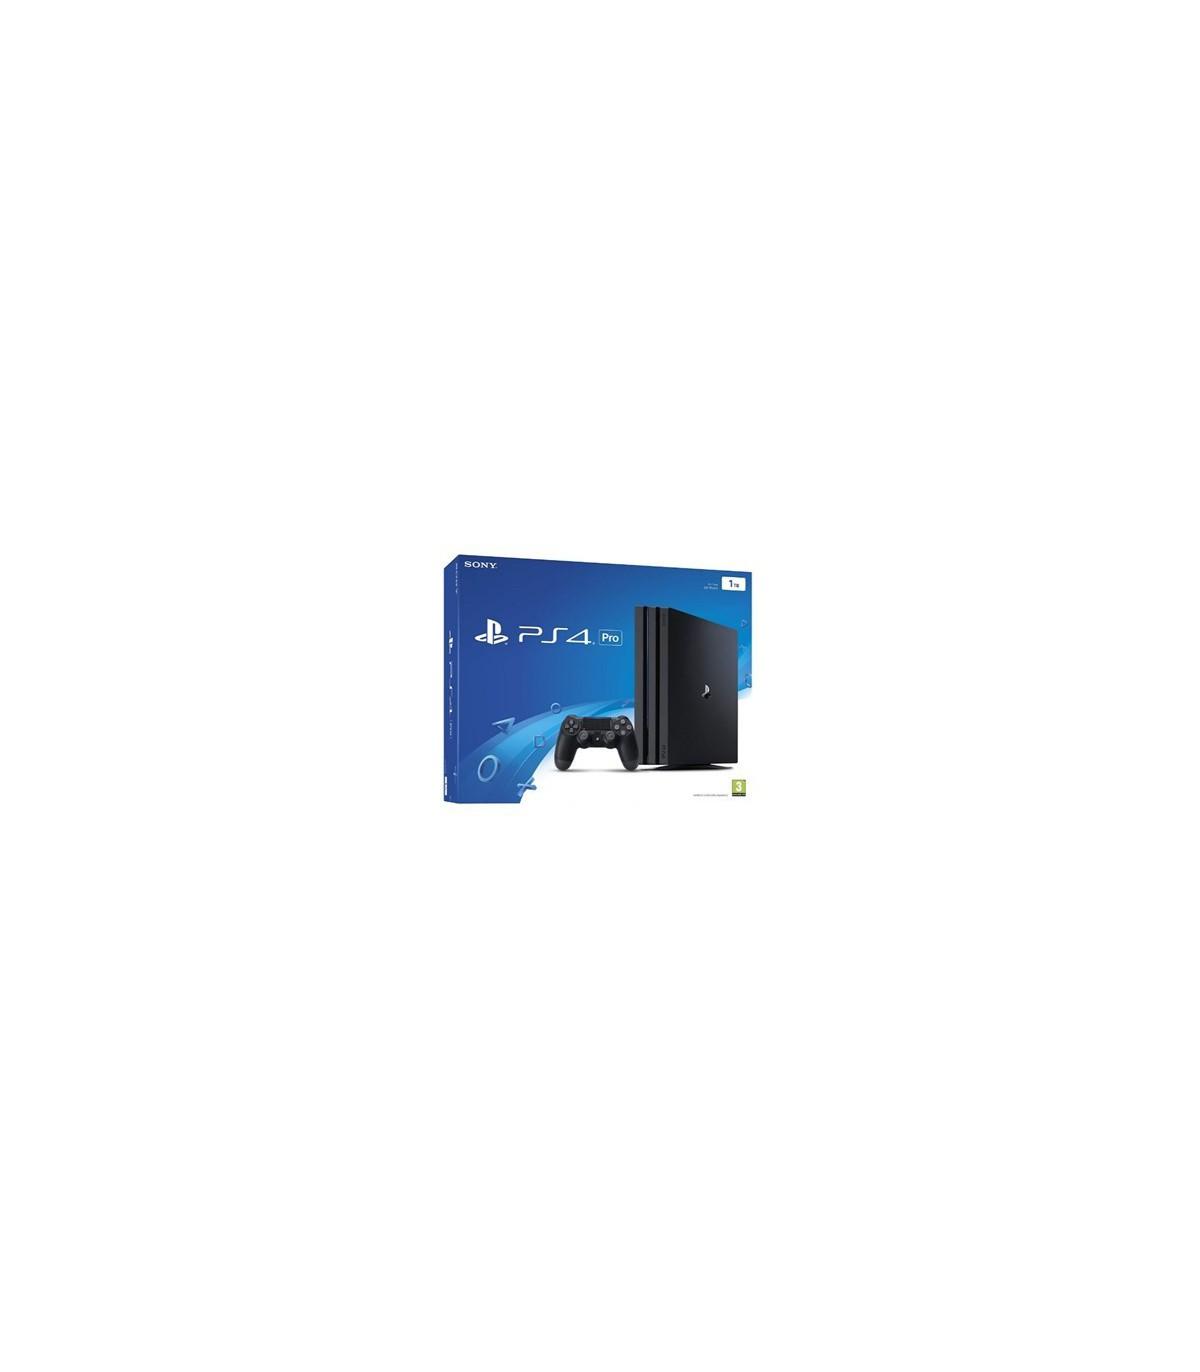 Playstation 4 Pro Region 1 - 1TB